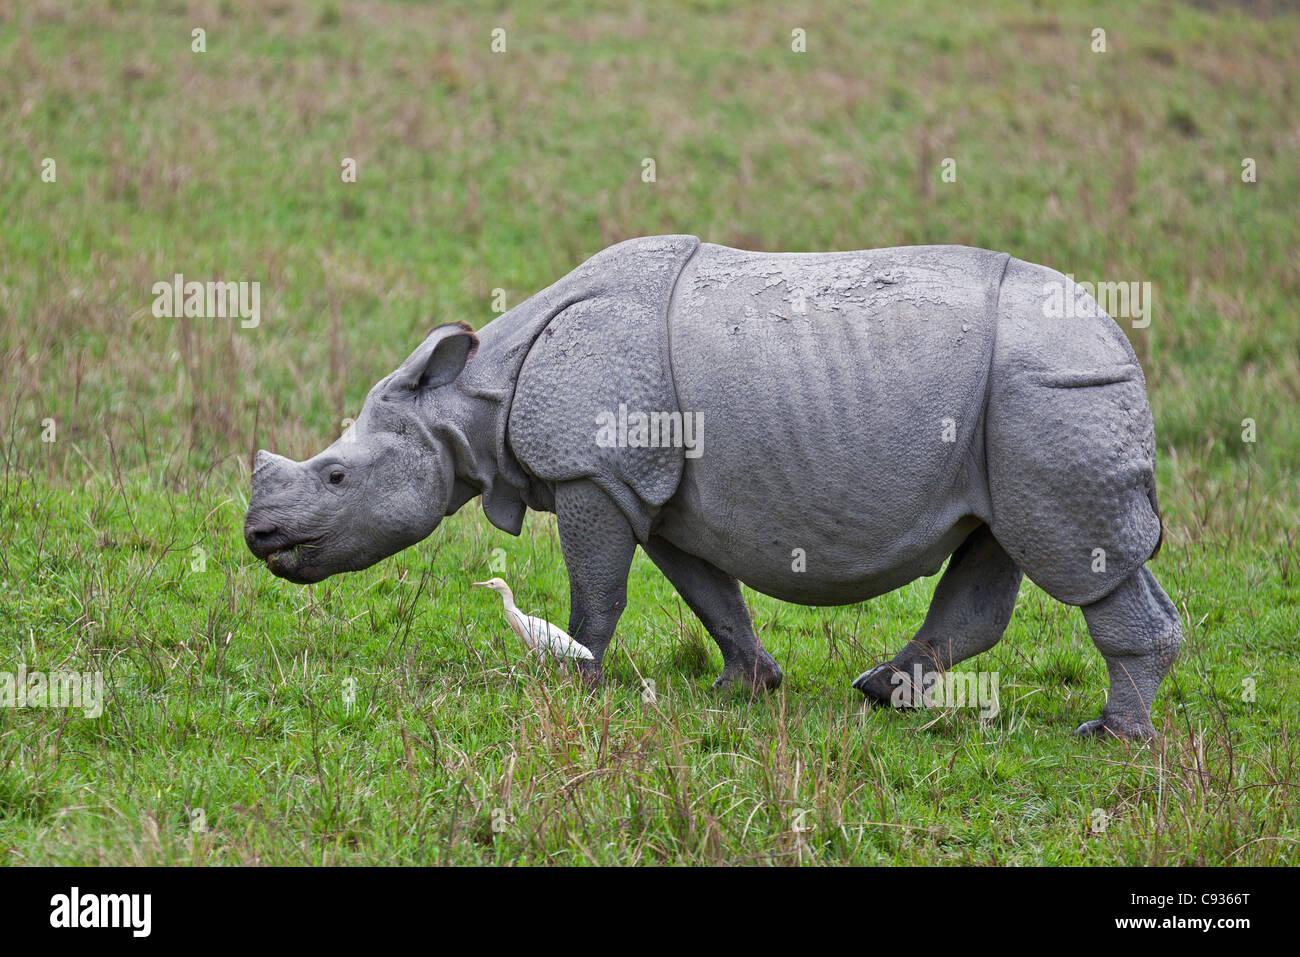 A Great Indian One-horned Rhino in Kaziranga National Park. - Stock Image